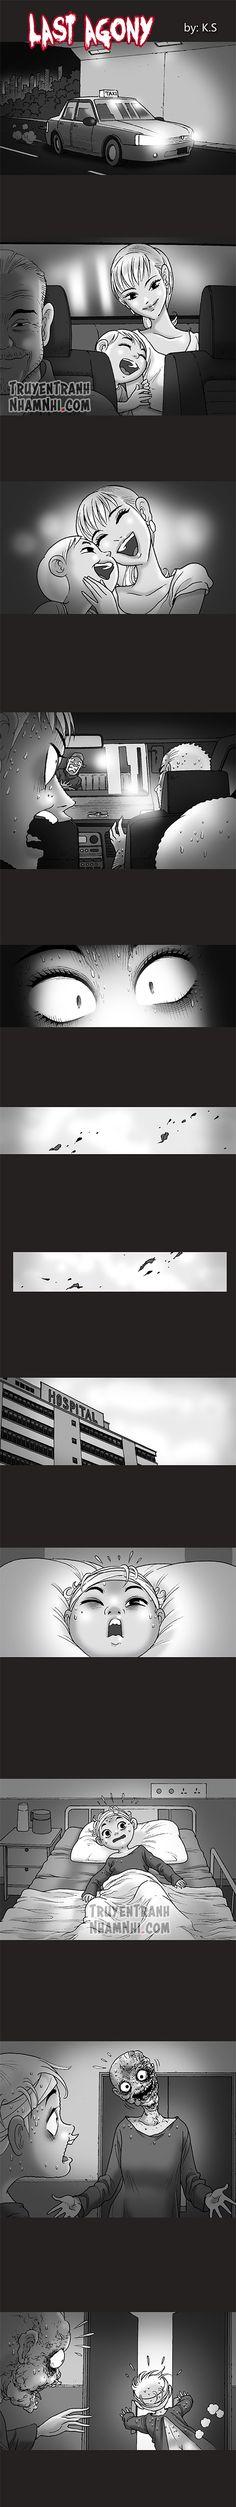 Silent Horror chap 196: Last agony - nỗi đau cuối cùng